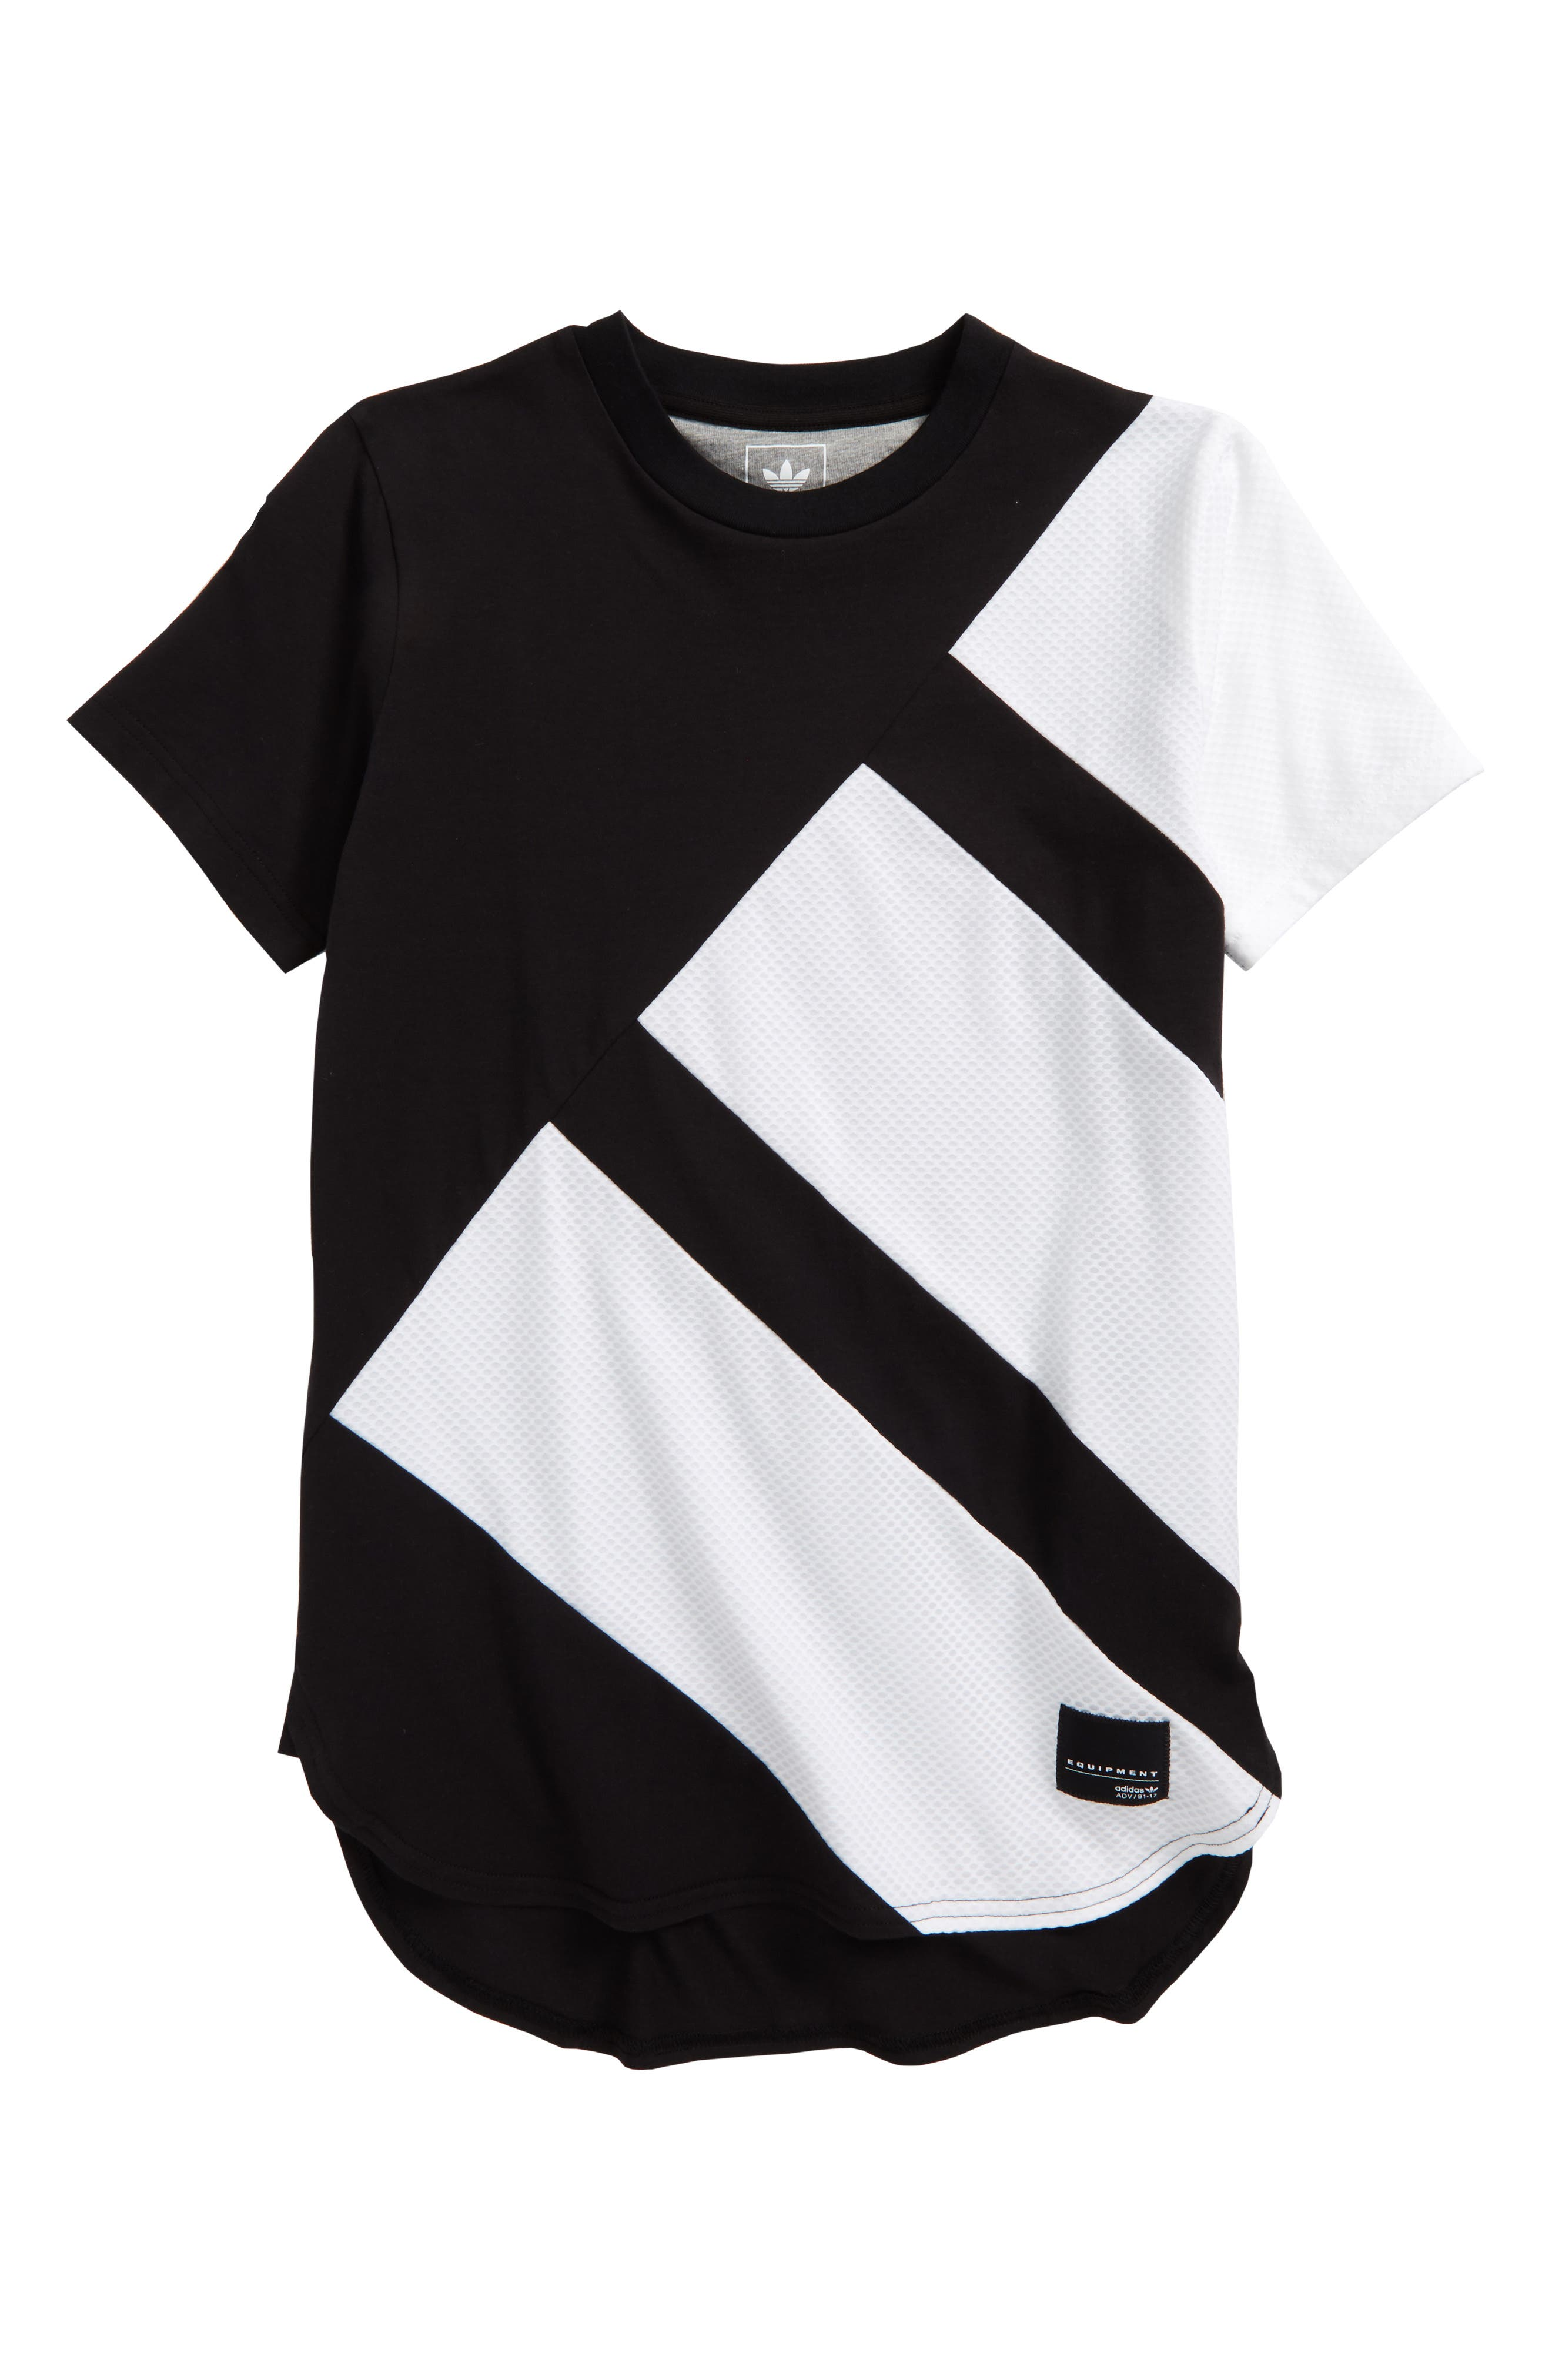 Alternate Image 1 Selected - adidas Originals EQT Elongated T-Shirt (Little Boys & Big Boys)